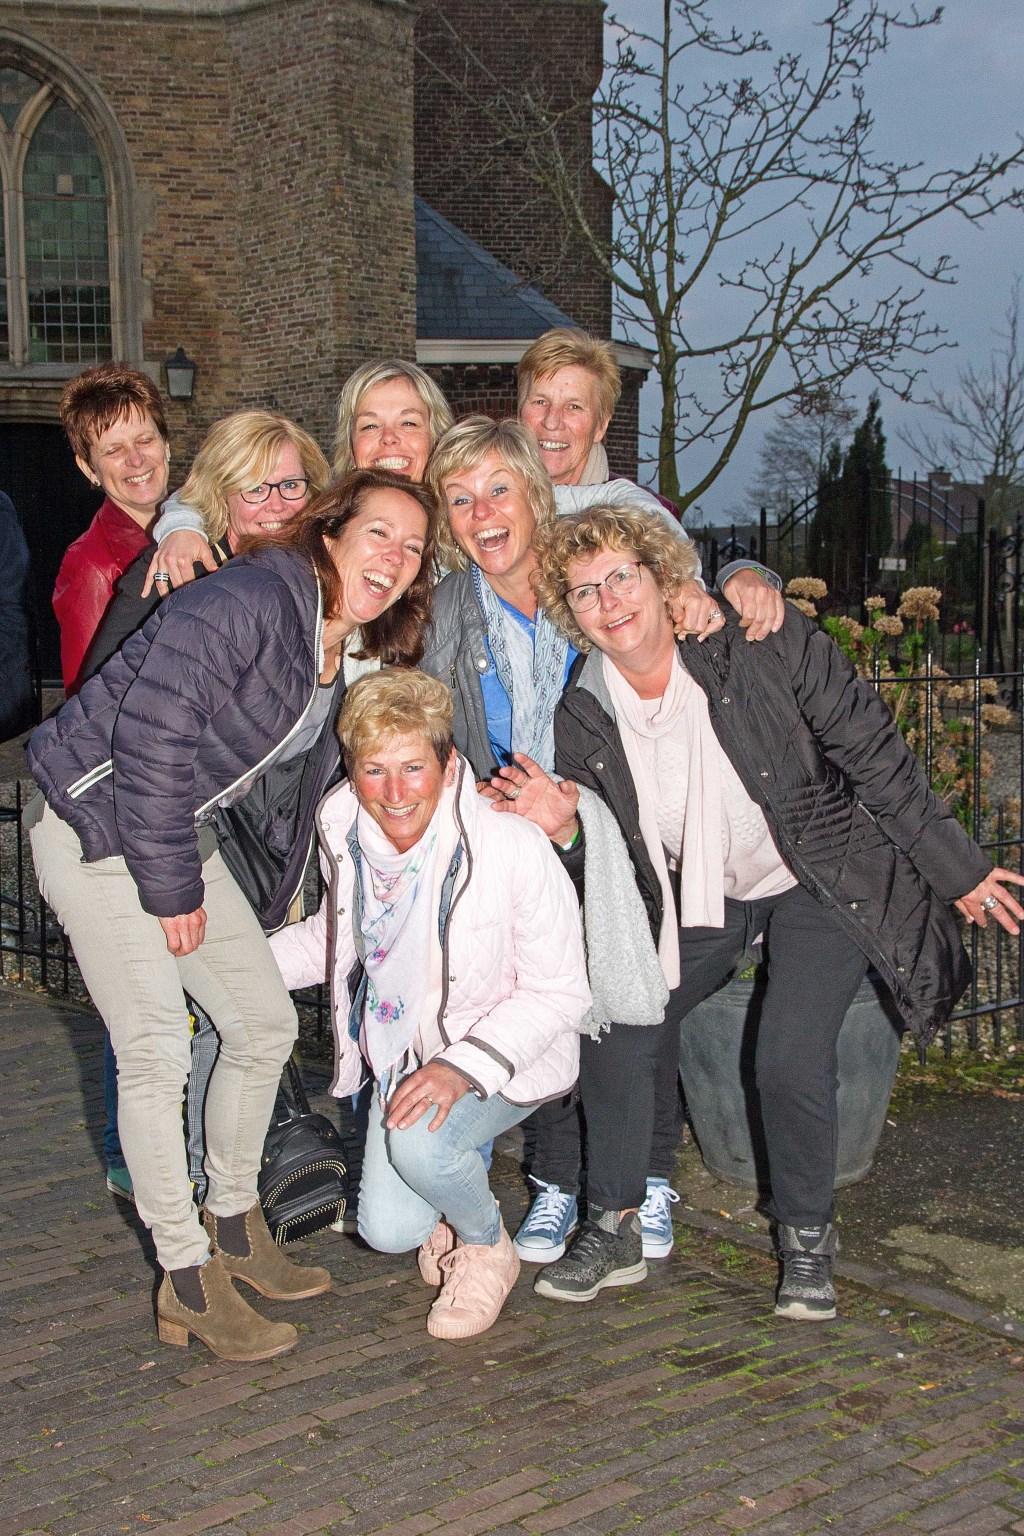 Foto: WimDumay Email:WBDumay@Casema.nl Web:WimDumay.nl © Telstar Uitgeverij B.V